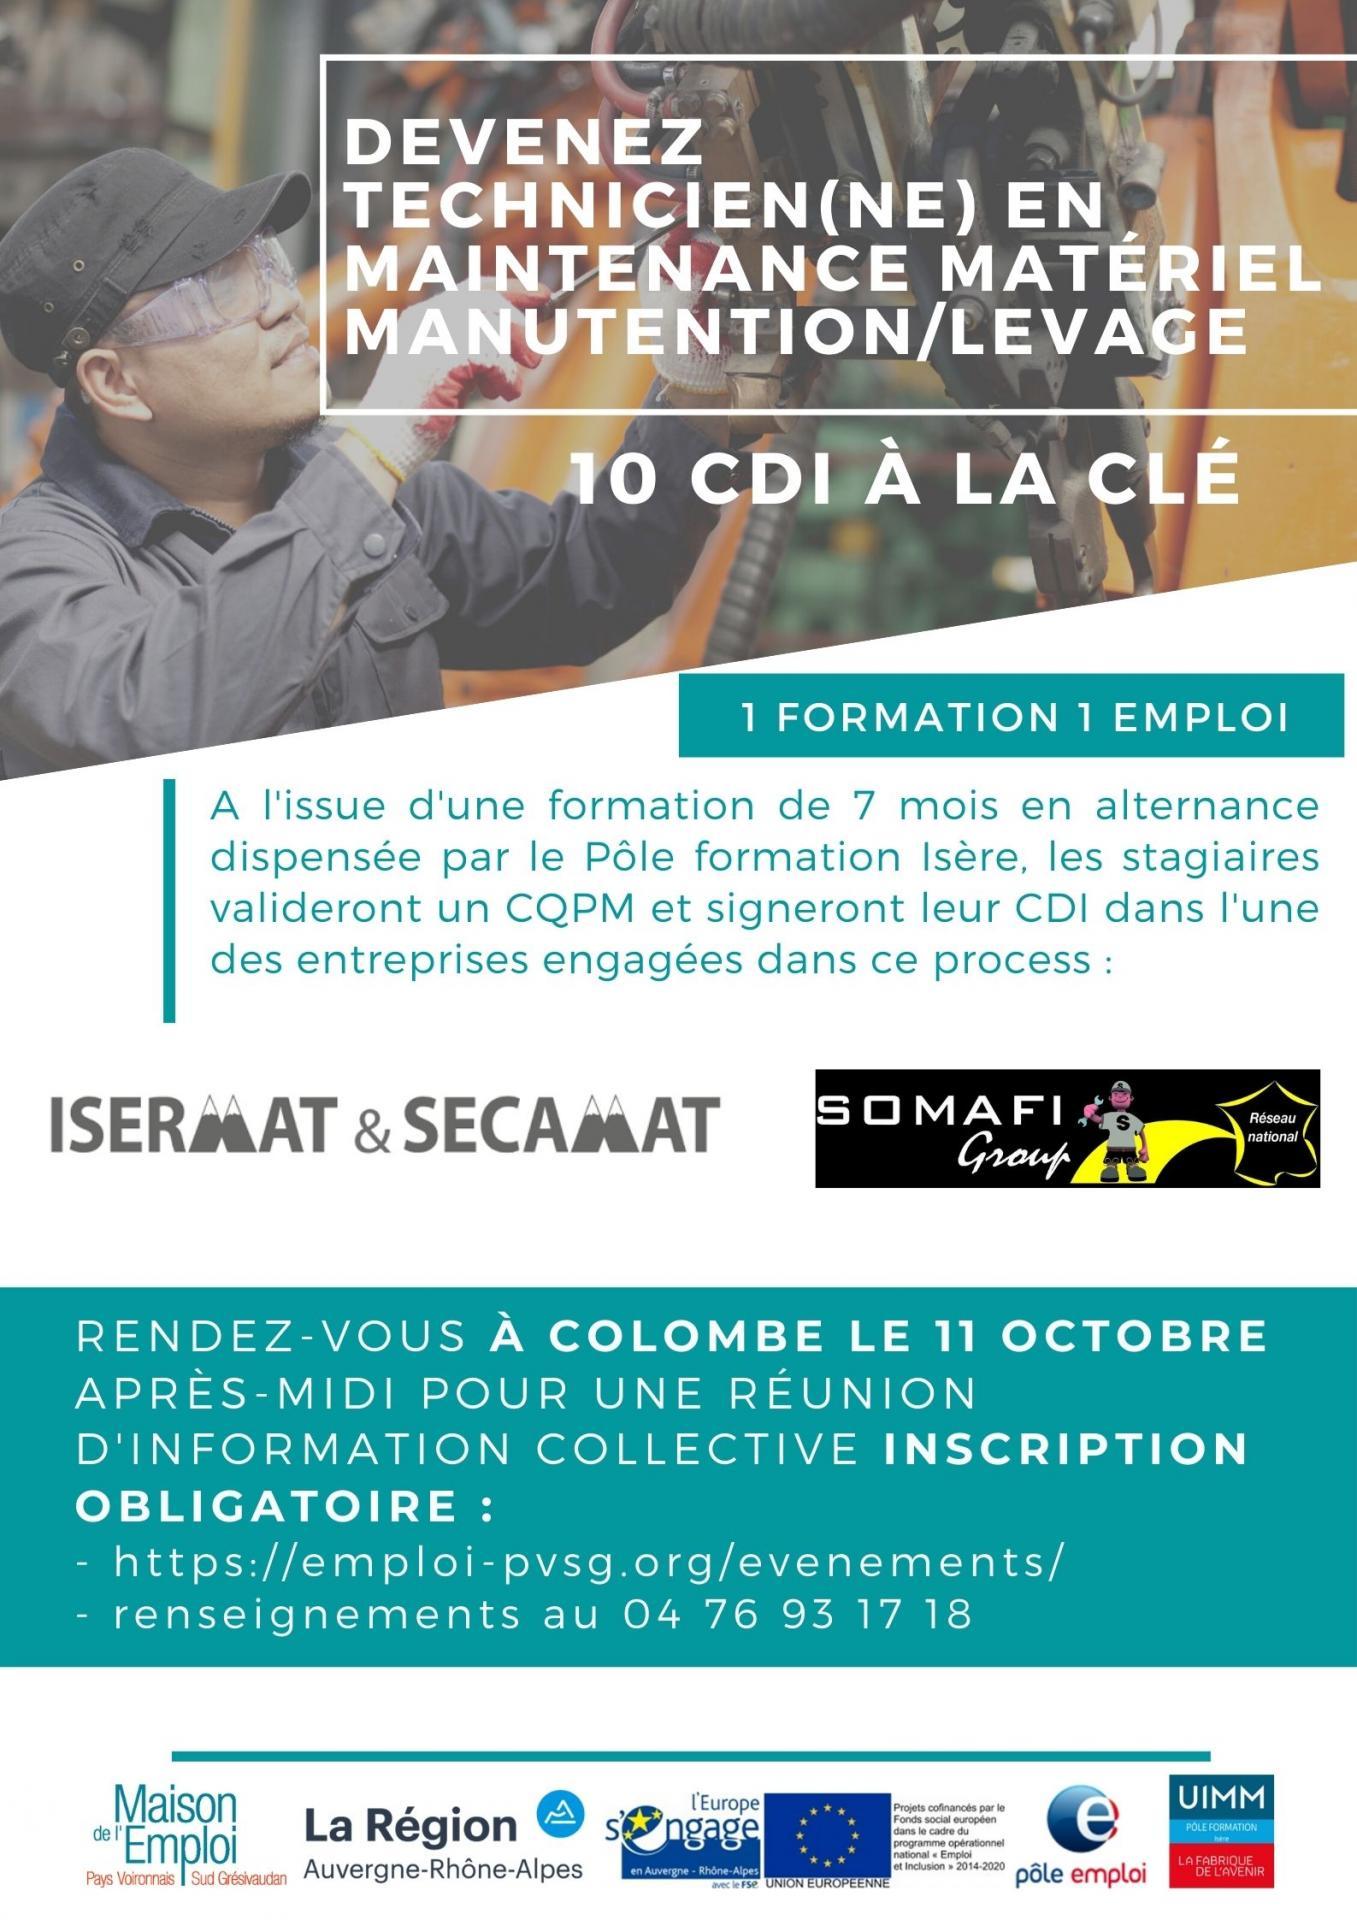 Affiche tech maintenance engin levagemanutention colombe